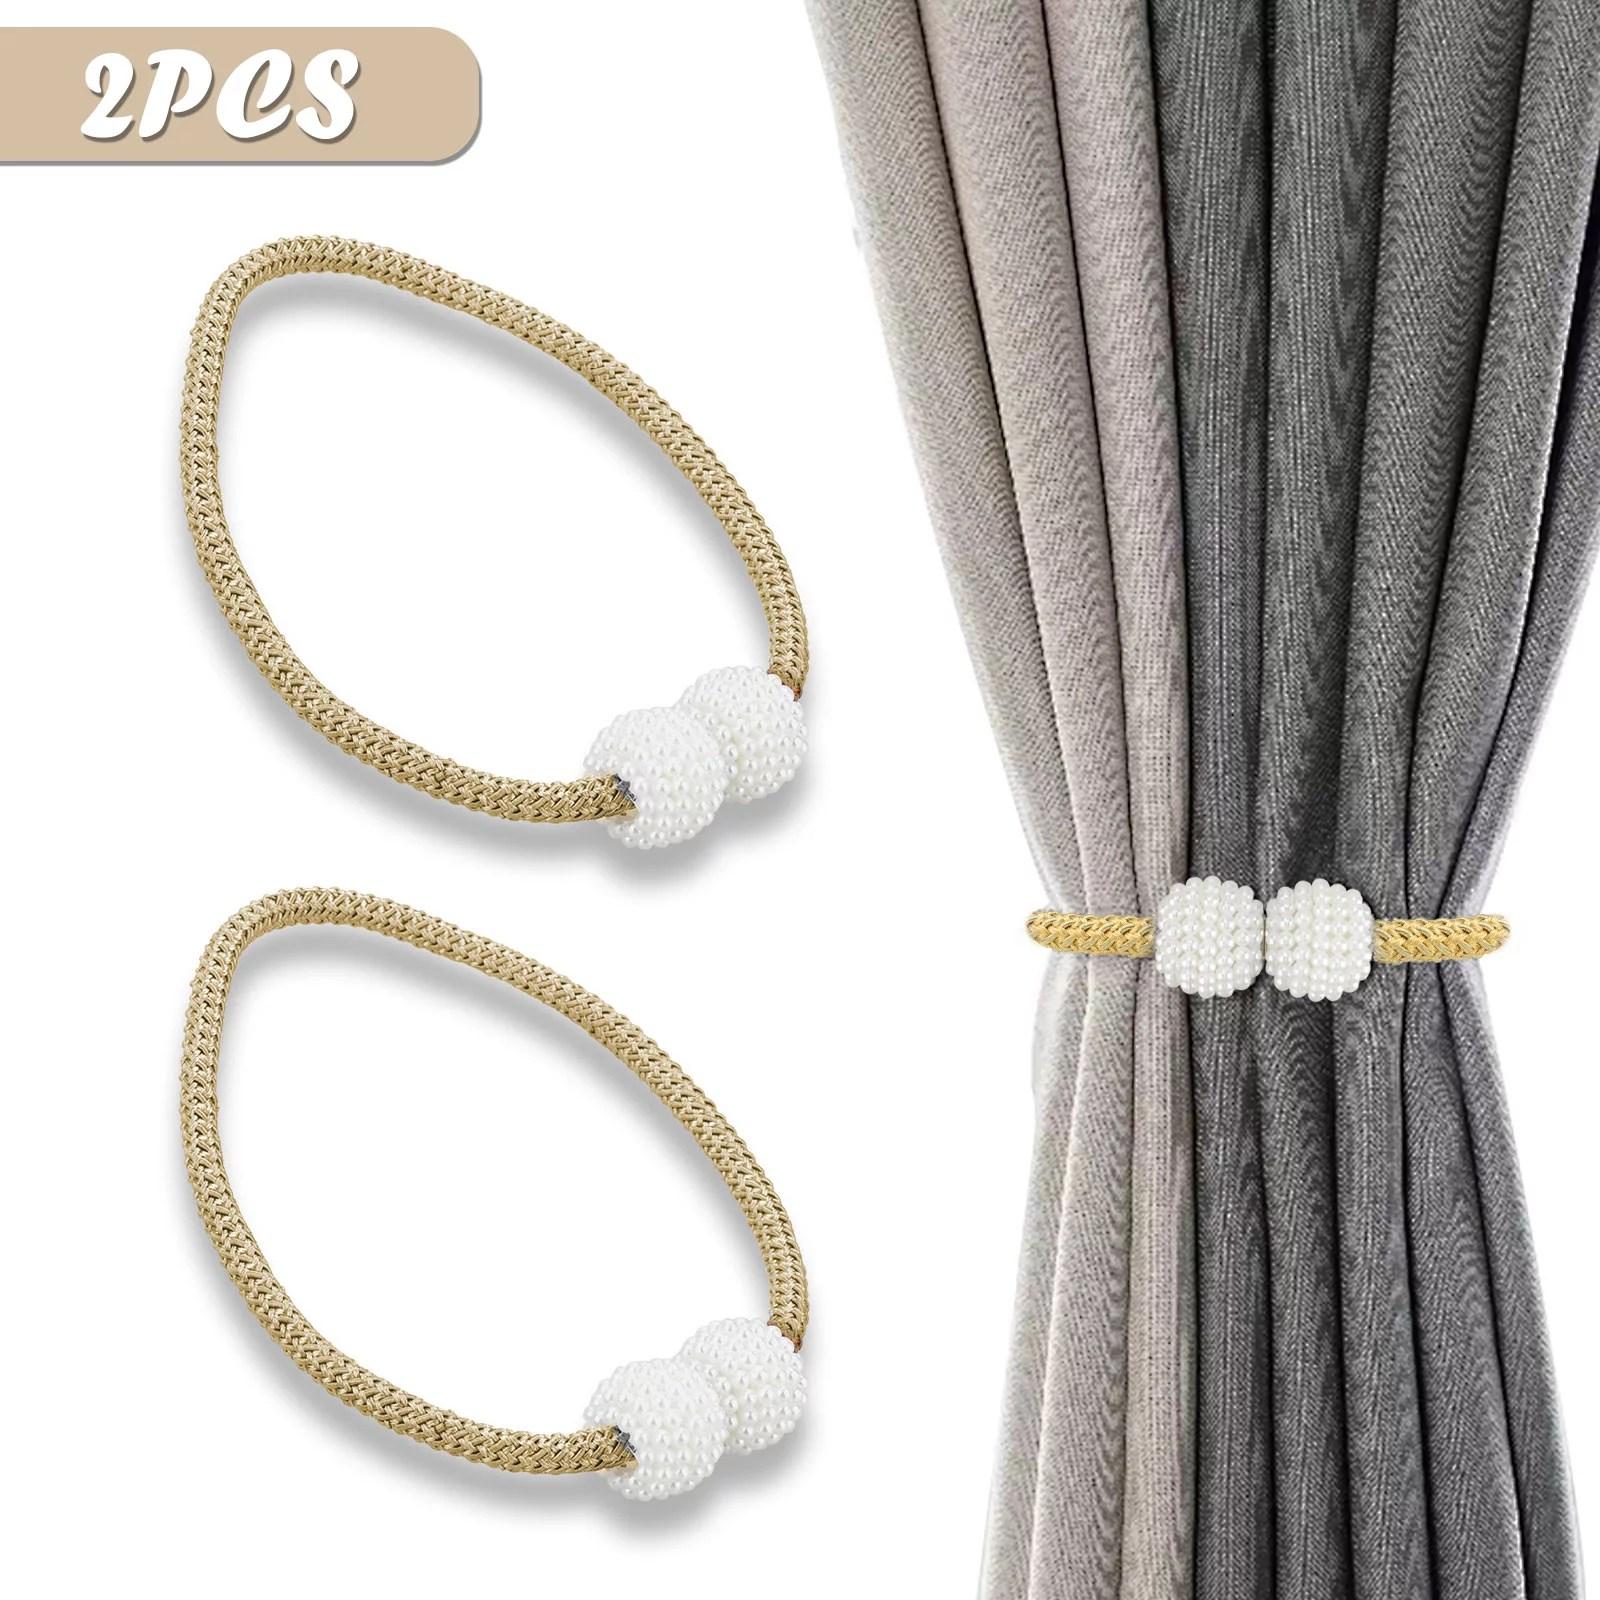 magnetic pearl ball curtain tiebacks tie backs holdbacks buckle clips accessory walmart com